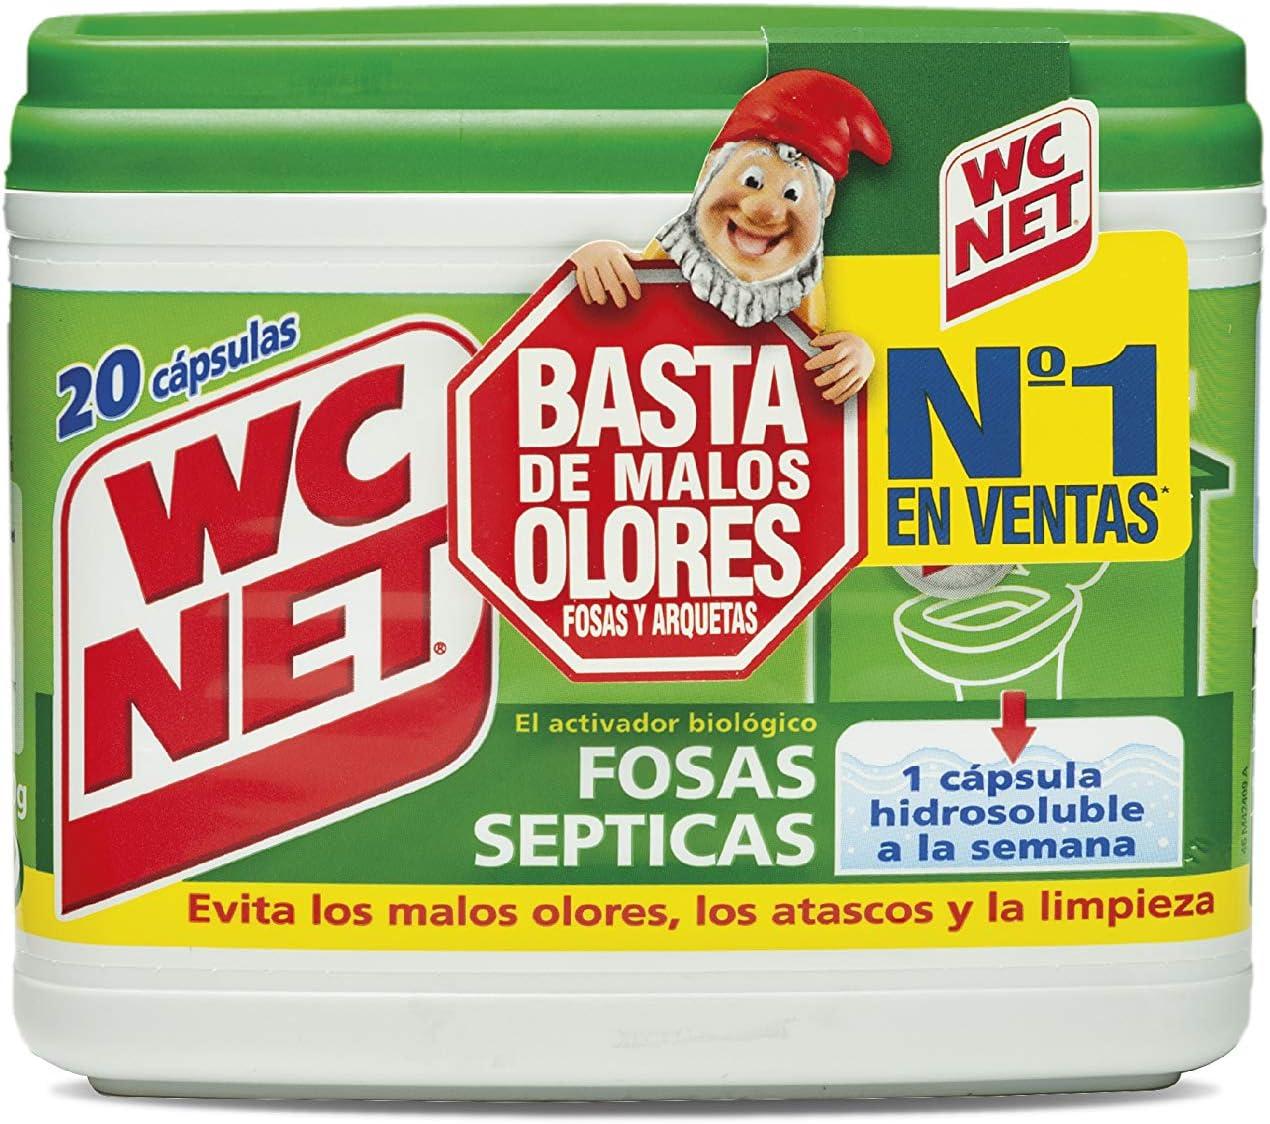 Wc Net Fosa Septica, 20 Capsulas x 18g, Multicolor